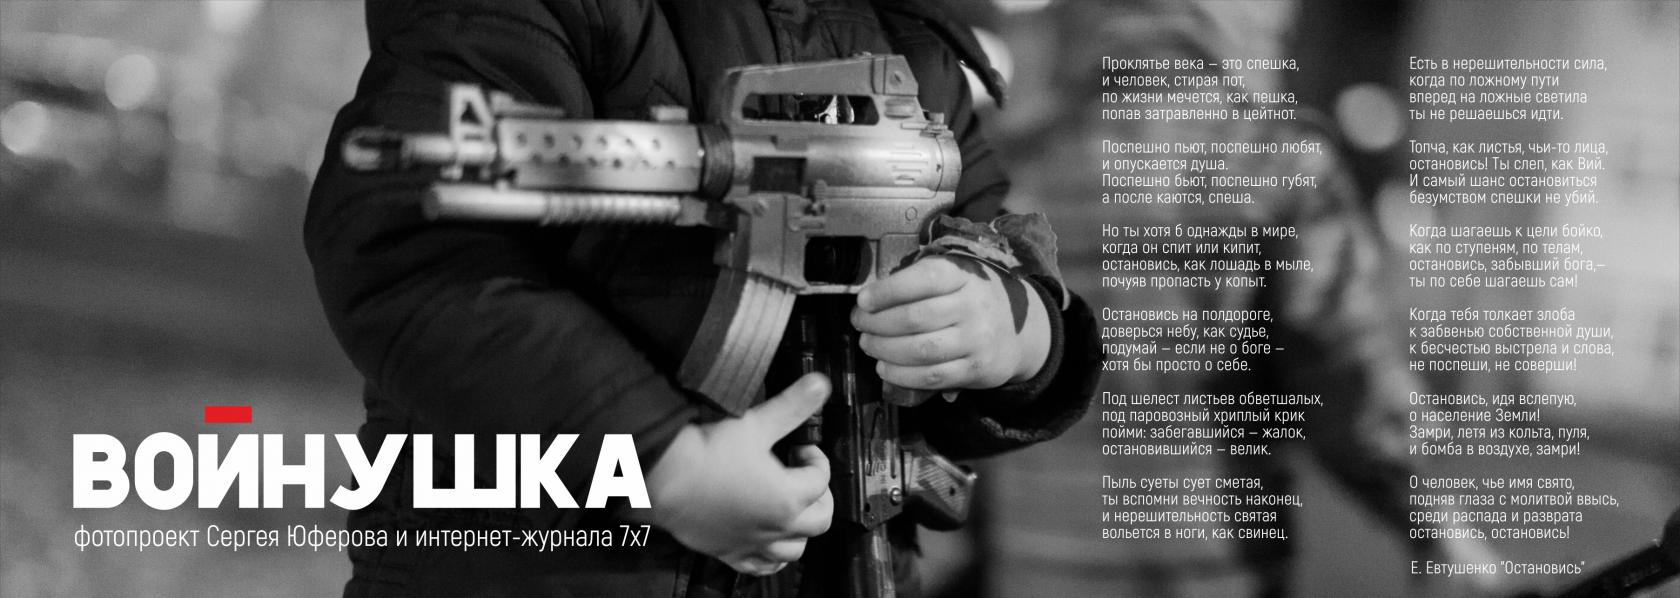 квартир Москва-Сити проклятие века это спешка евтушенко прогноз: декабрь